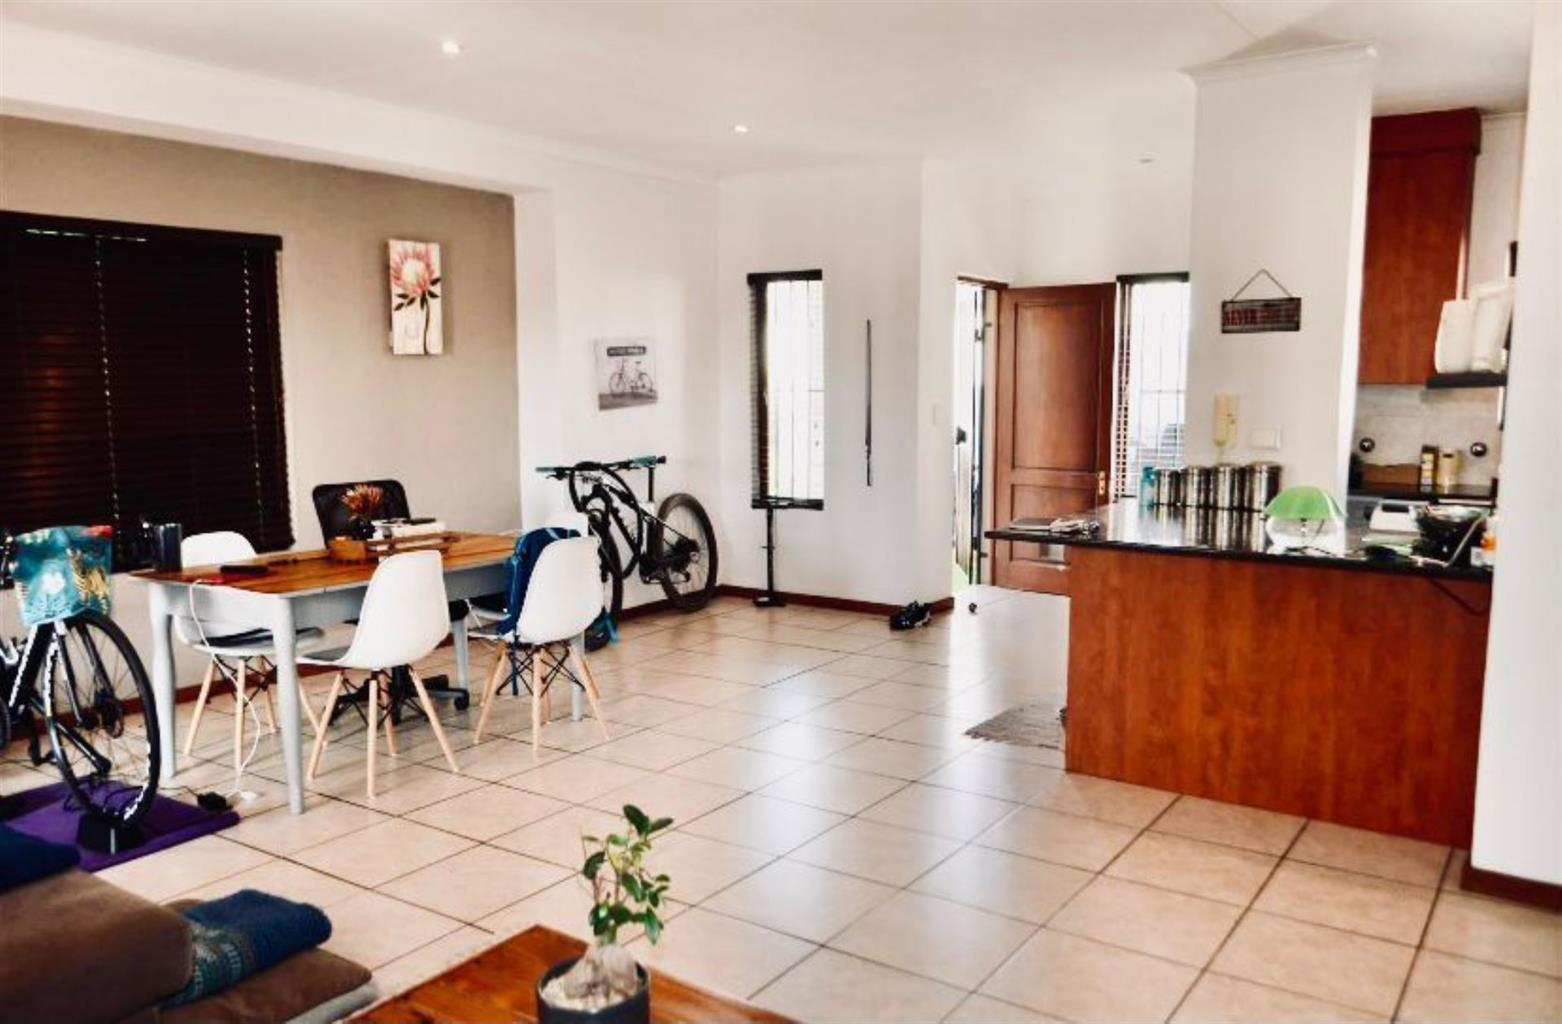 Townhouse Rental Monthly in PAULSHOF